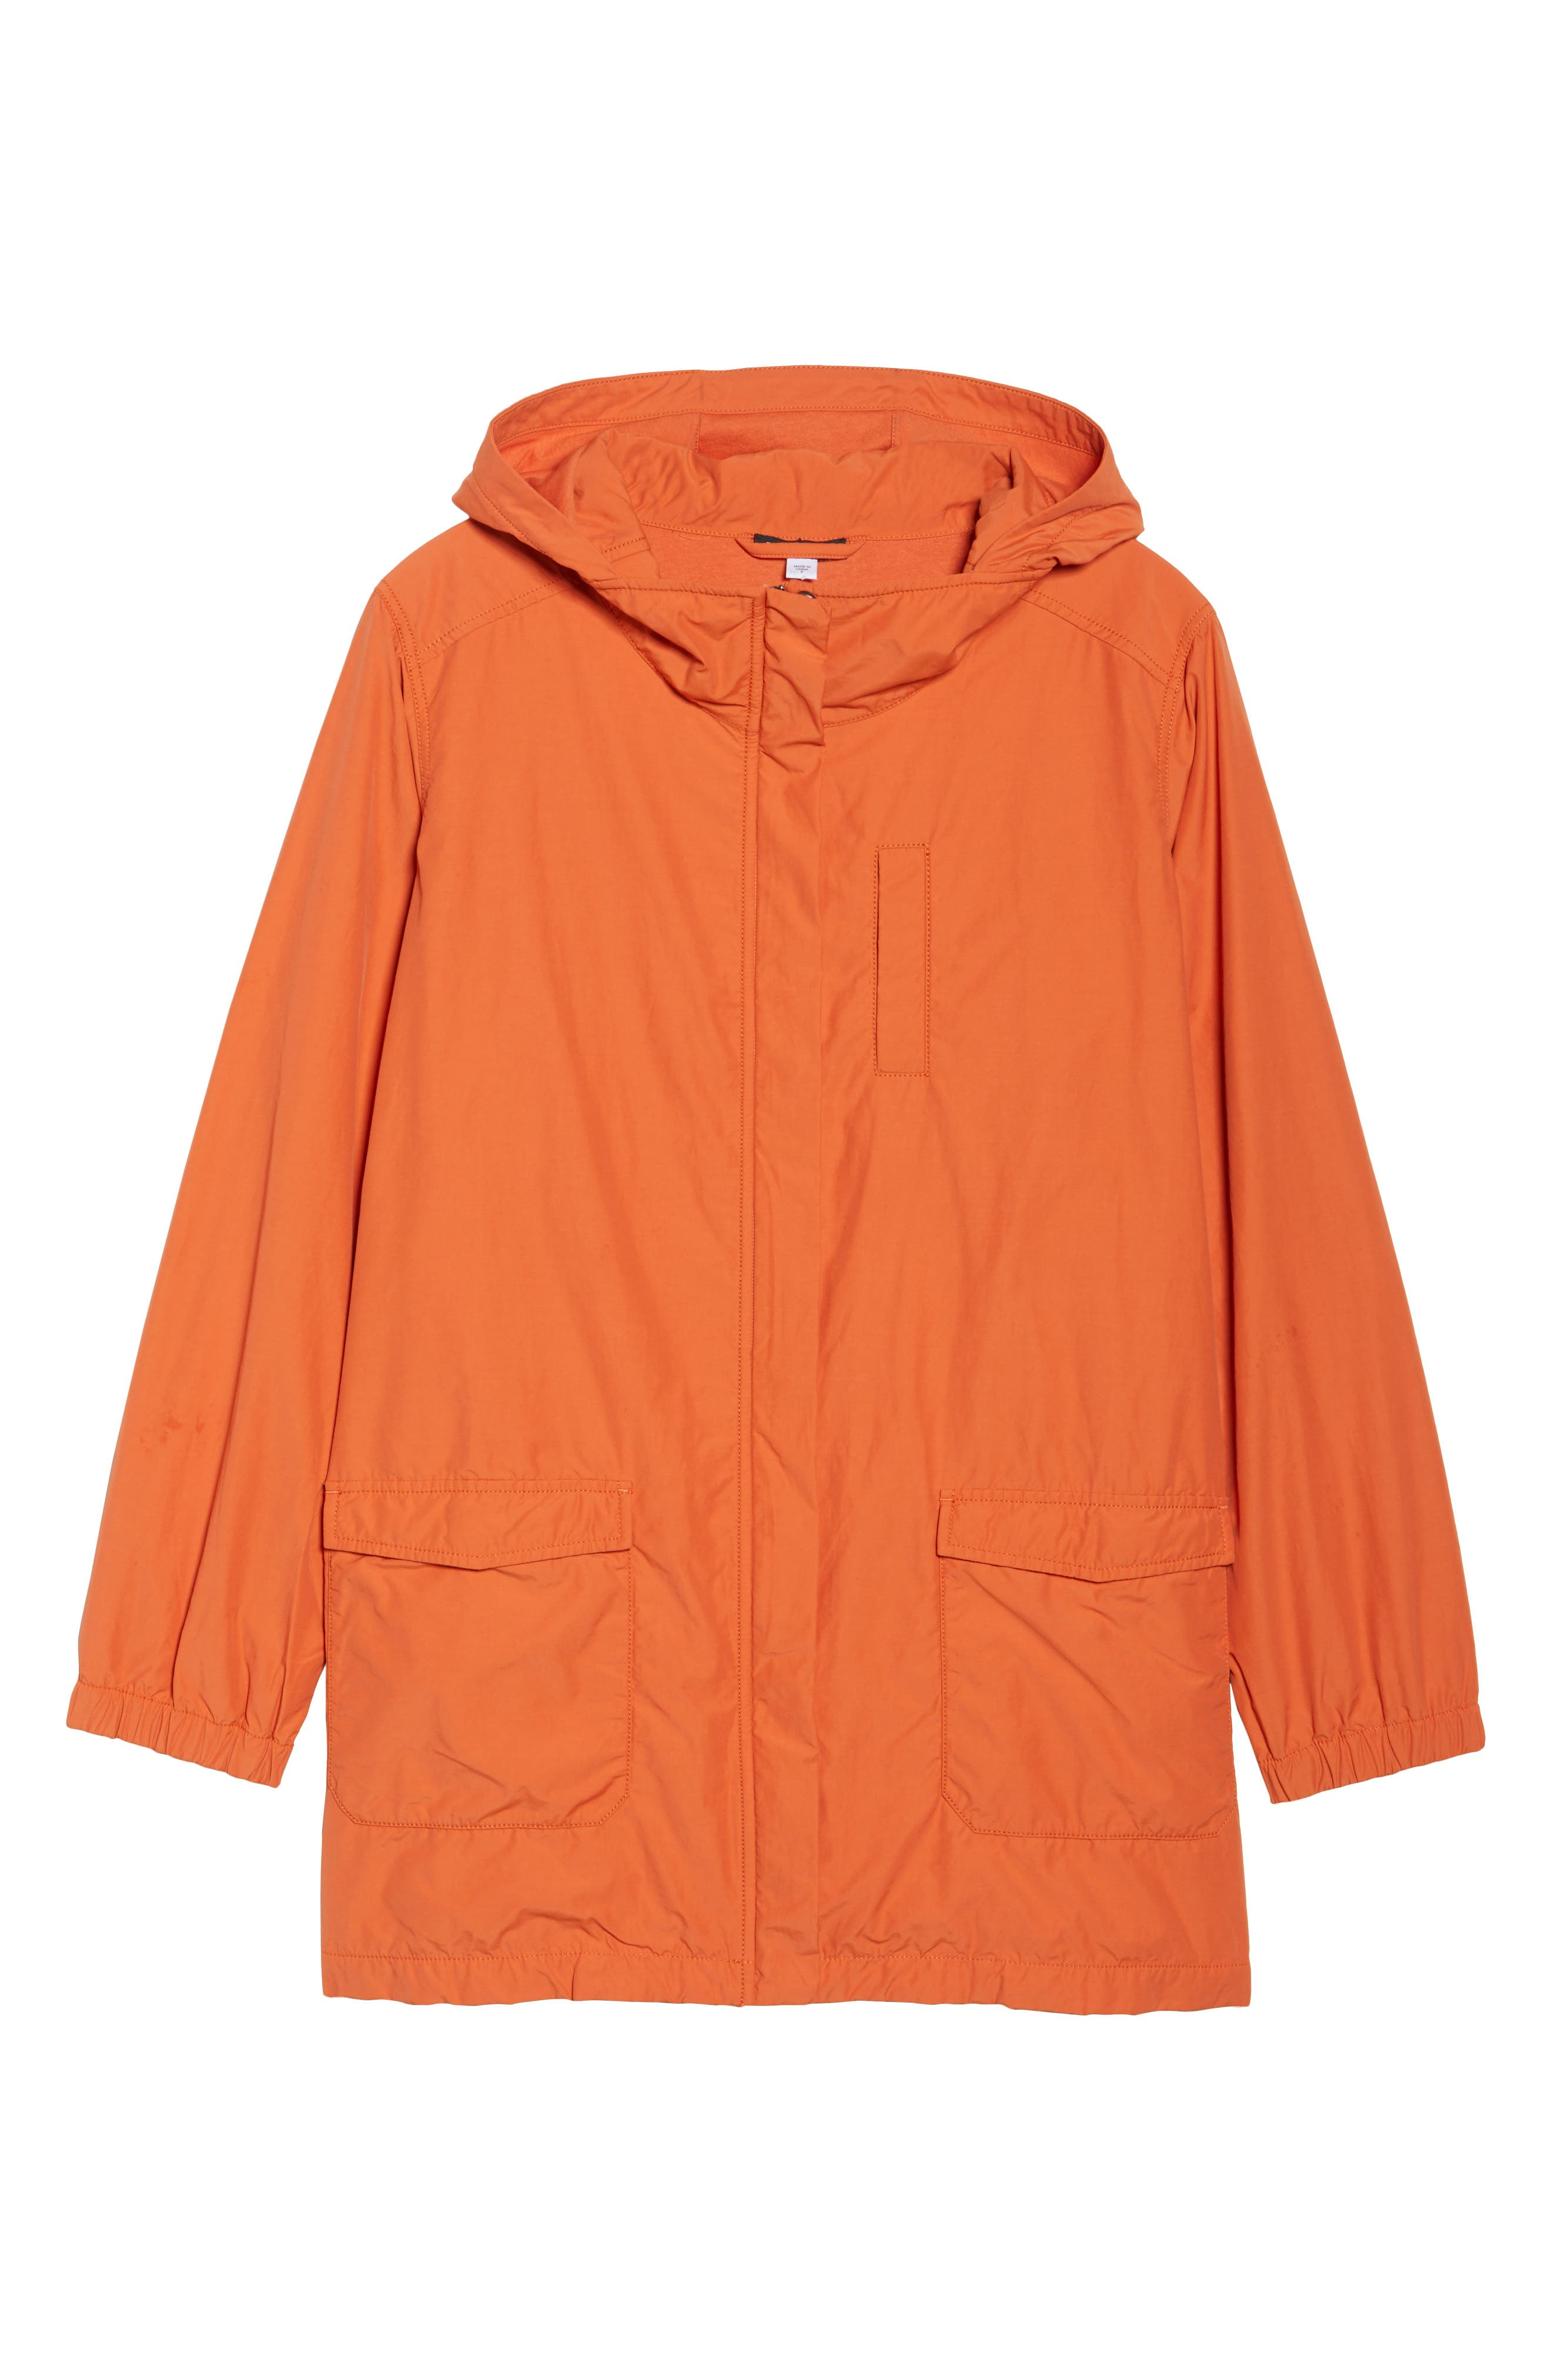 Hooded Organic Cotton Blend Jacket,                             Alternate thumbnail 5, color,                             001